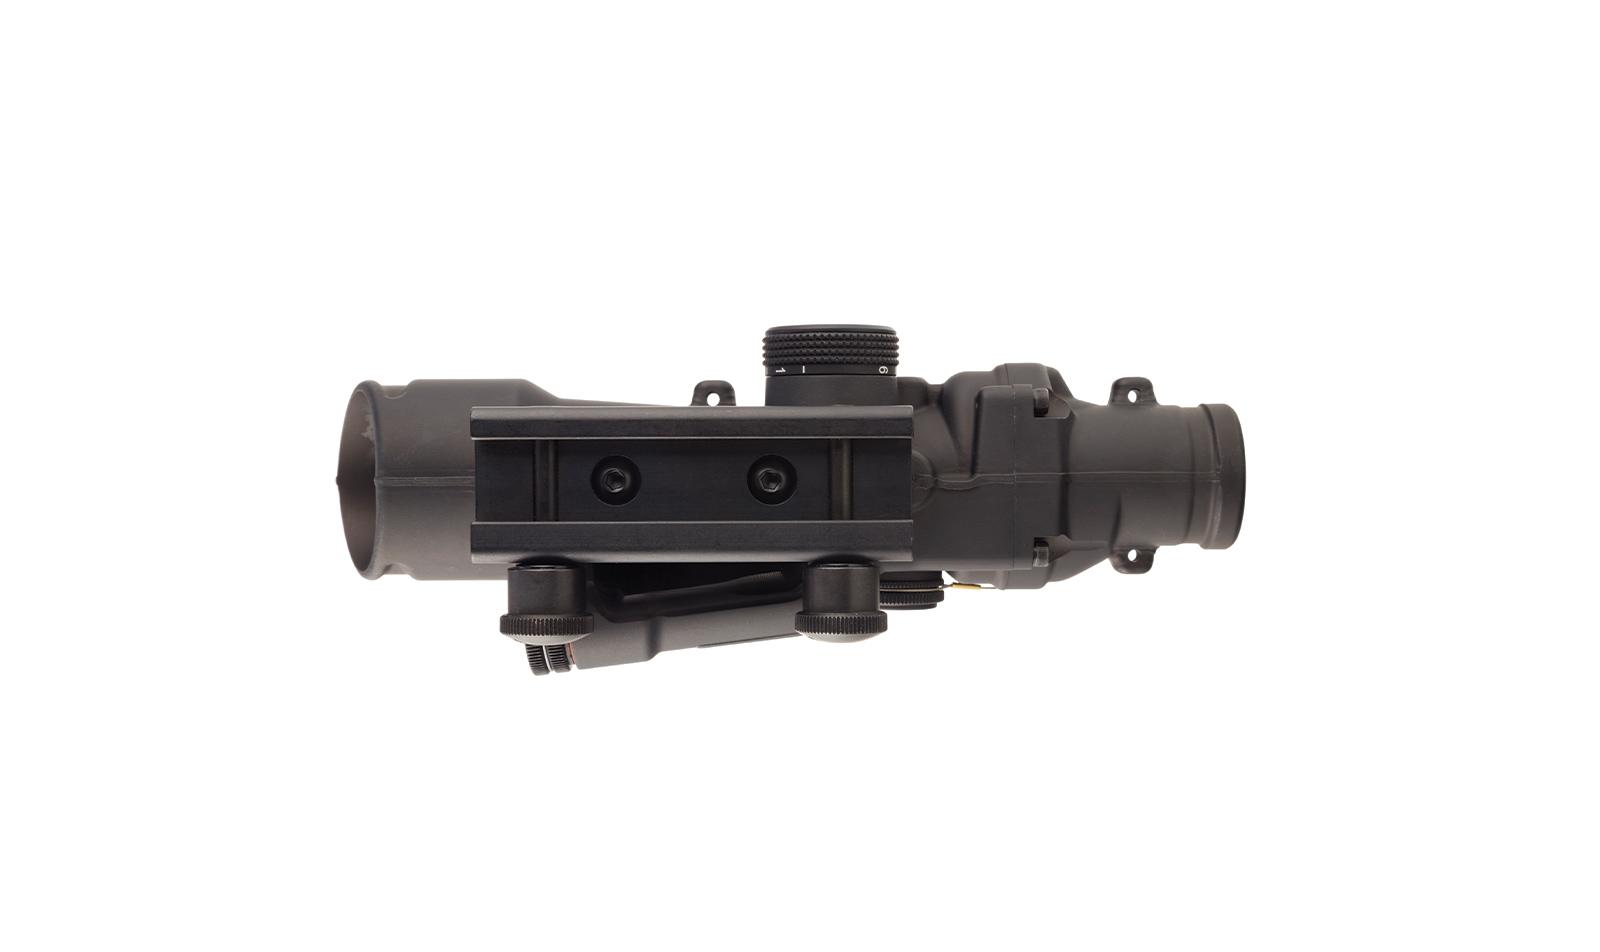 TA110-D-100501 angle 10